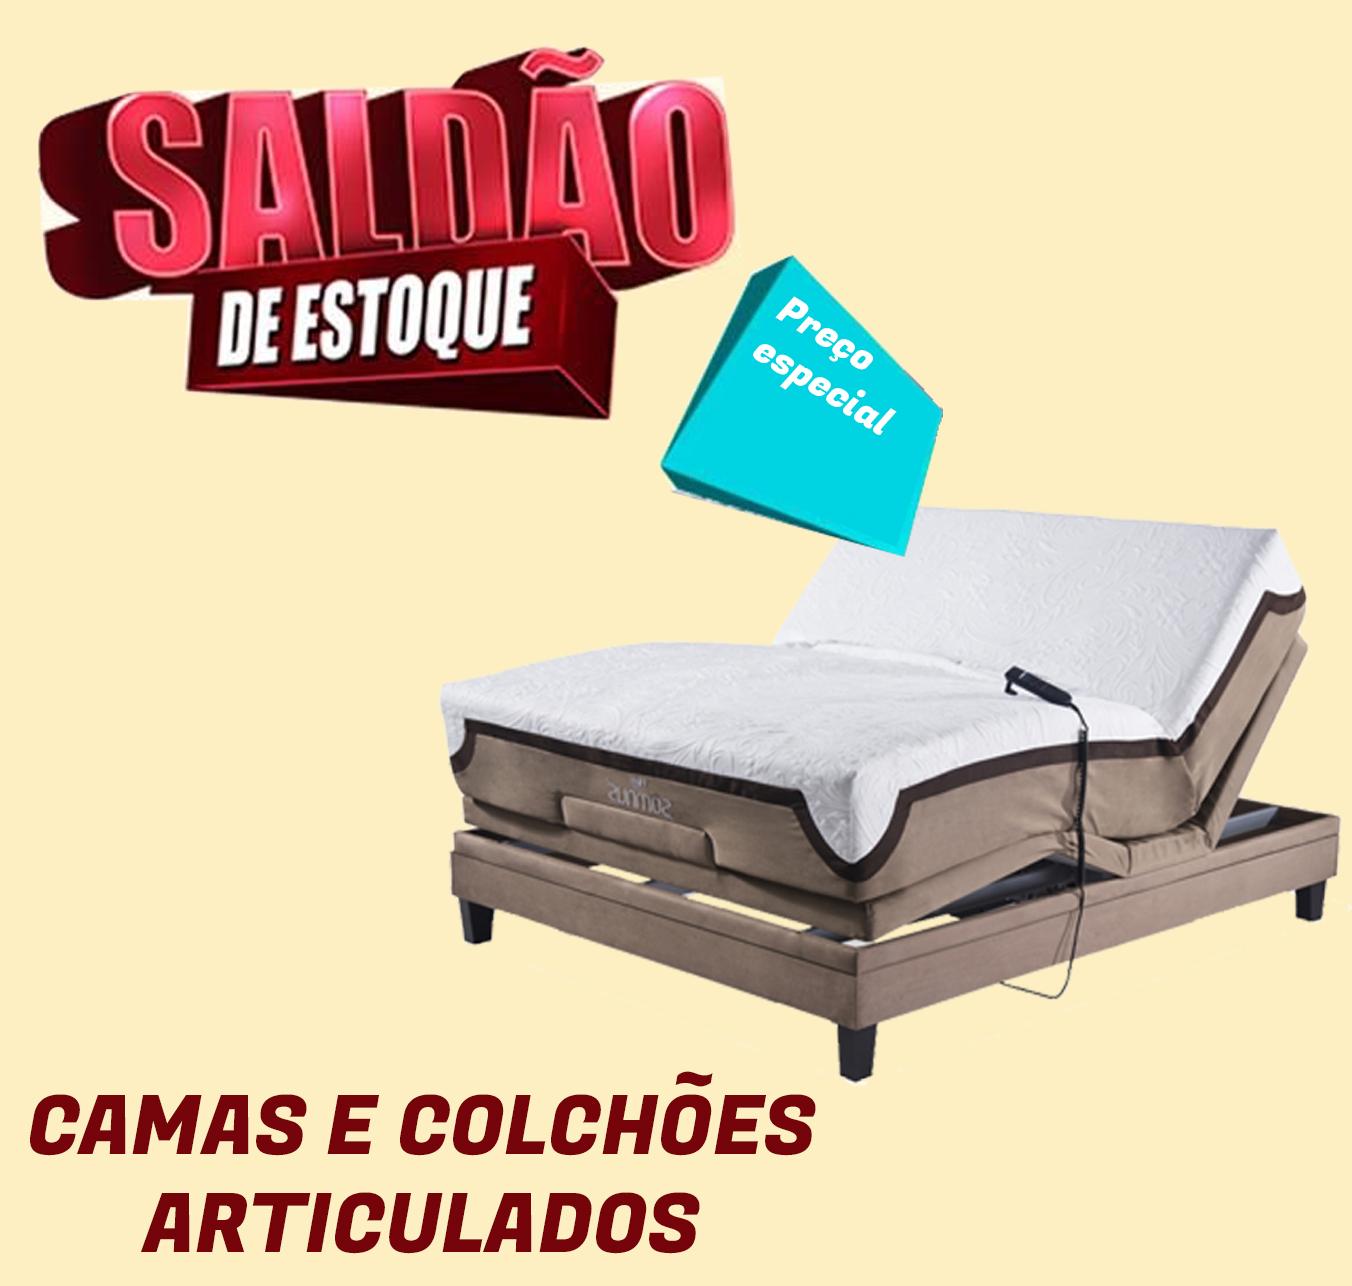 47a66654b Cama Articulada Saga Brasil